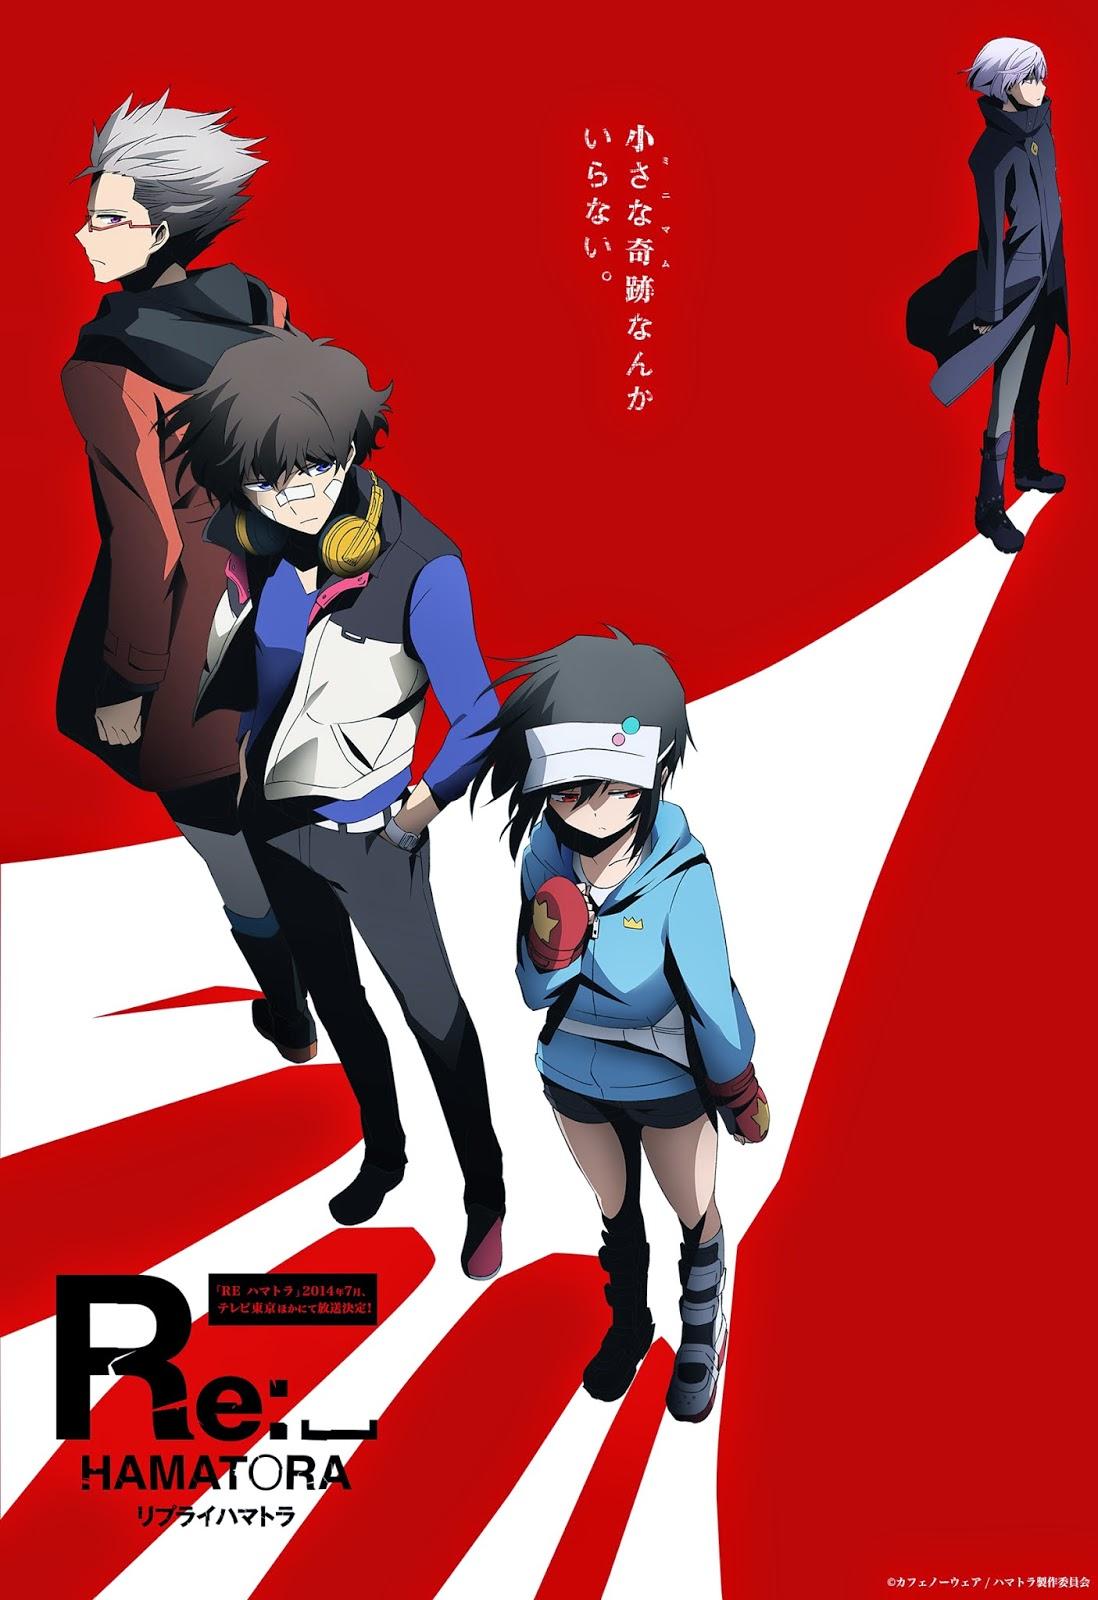 [ Info-Anime ] Re-Hamatora Akan Tayang Pada Bulan Juli Dengan Anime Studio Lerche